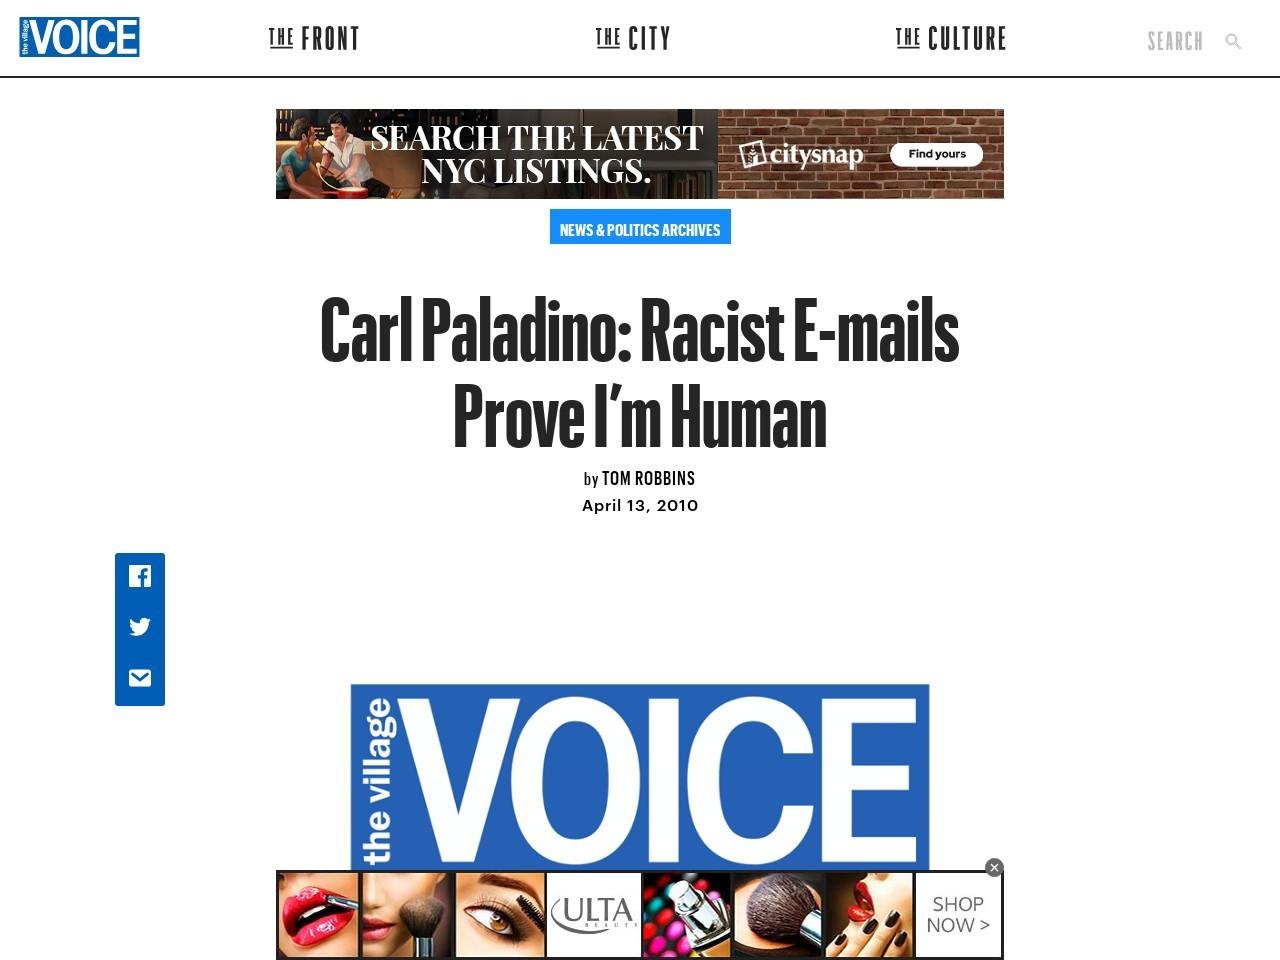 Carl Paladino: Racist E-mails Prove I'm Human